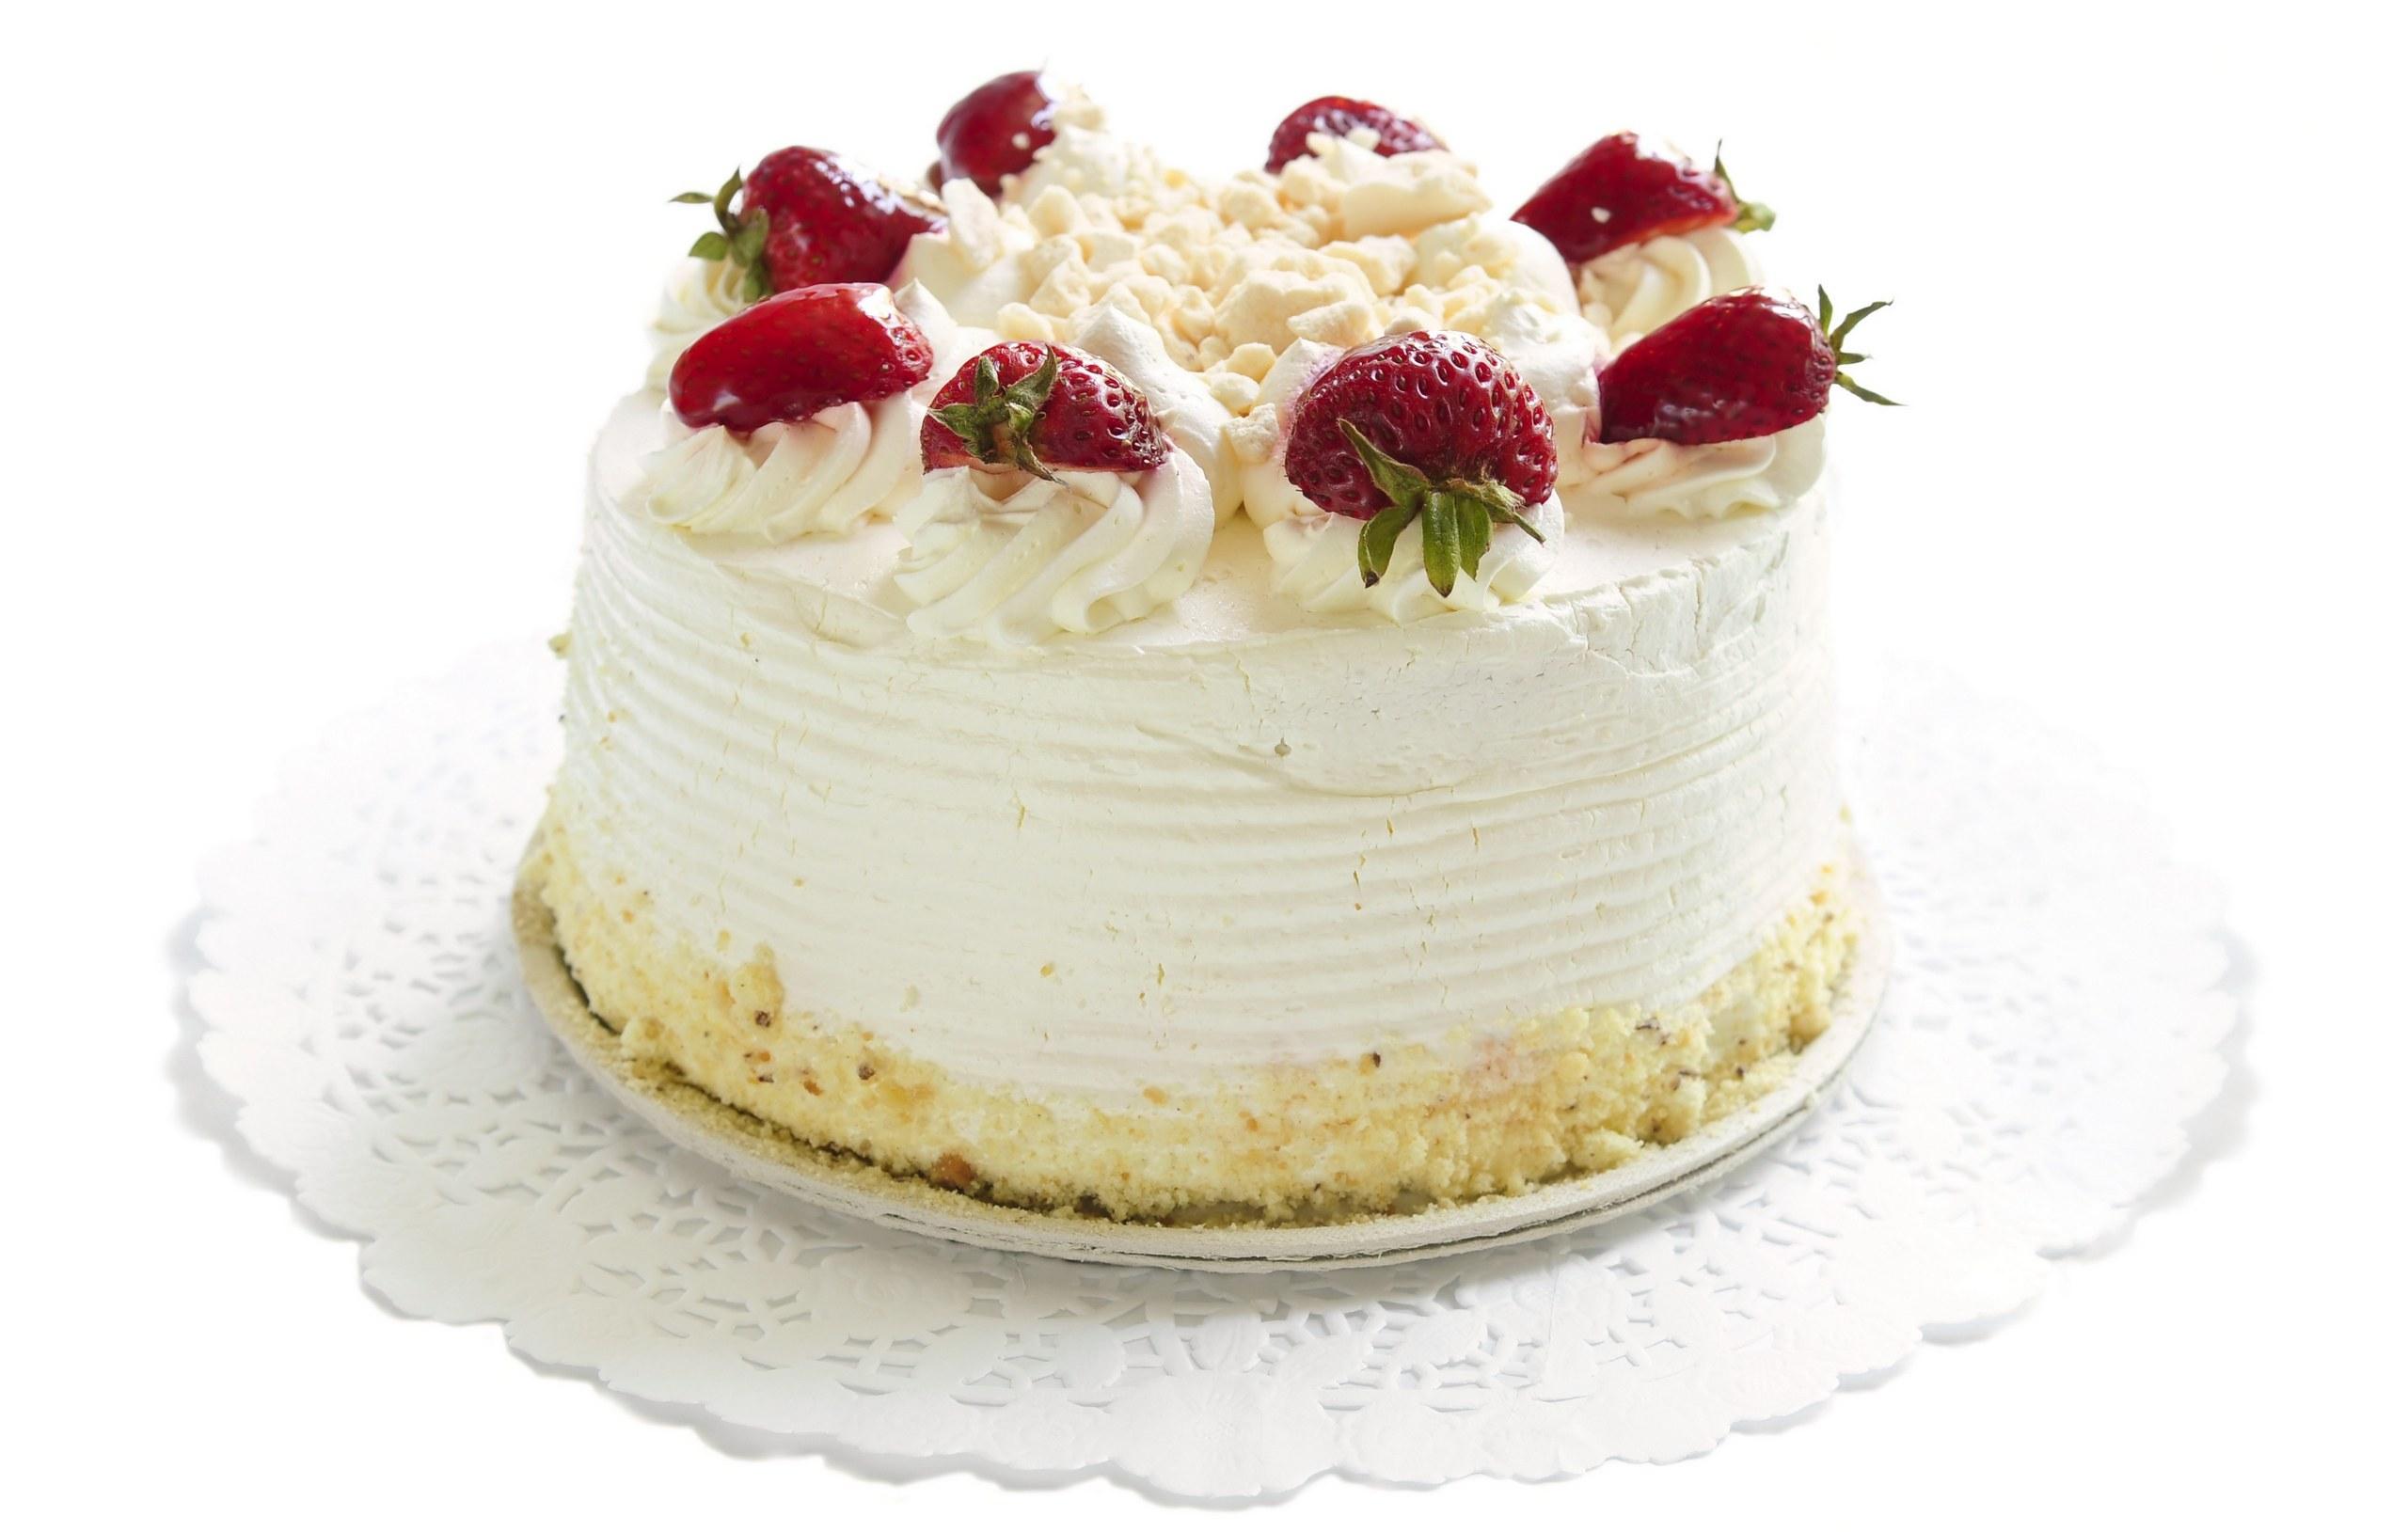 Imagini pentru cake with white chocolate